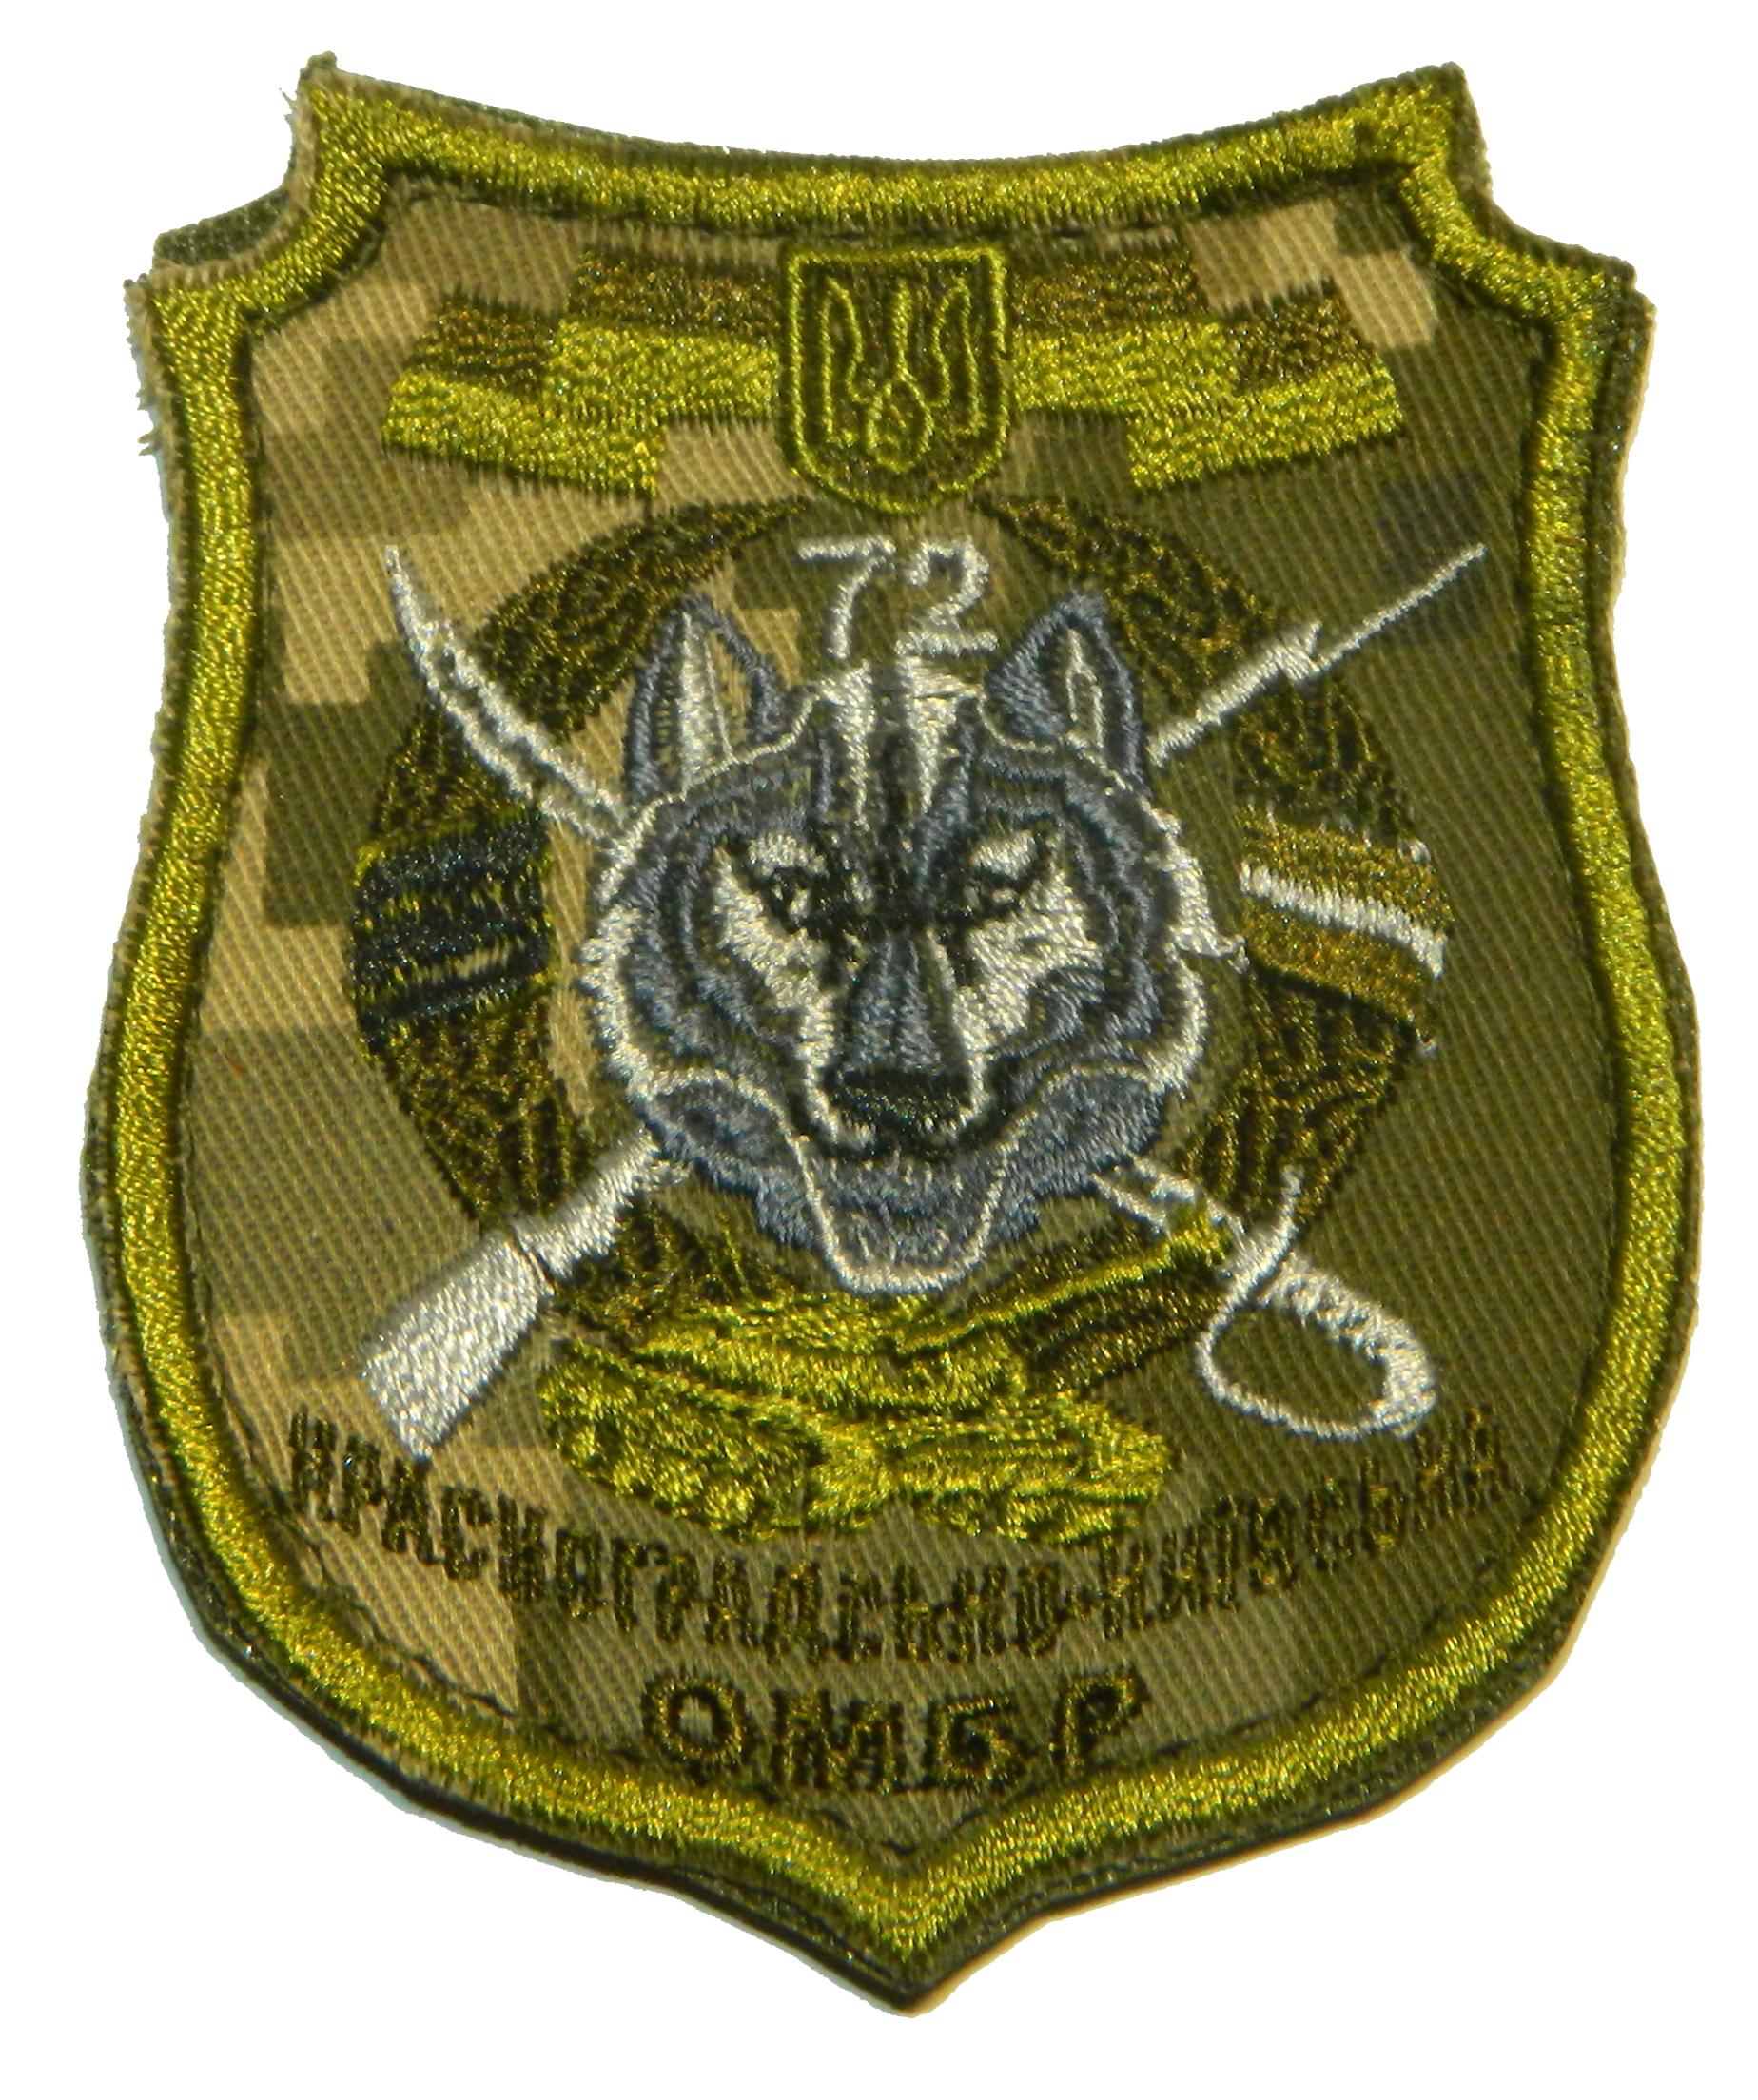 72-okrema-mehan%D1%96zovana-brigada-shev